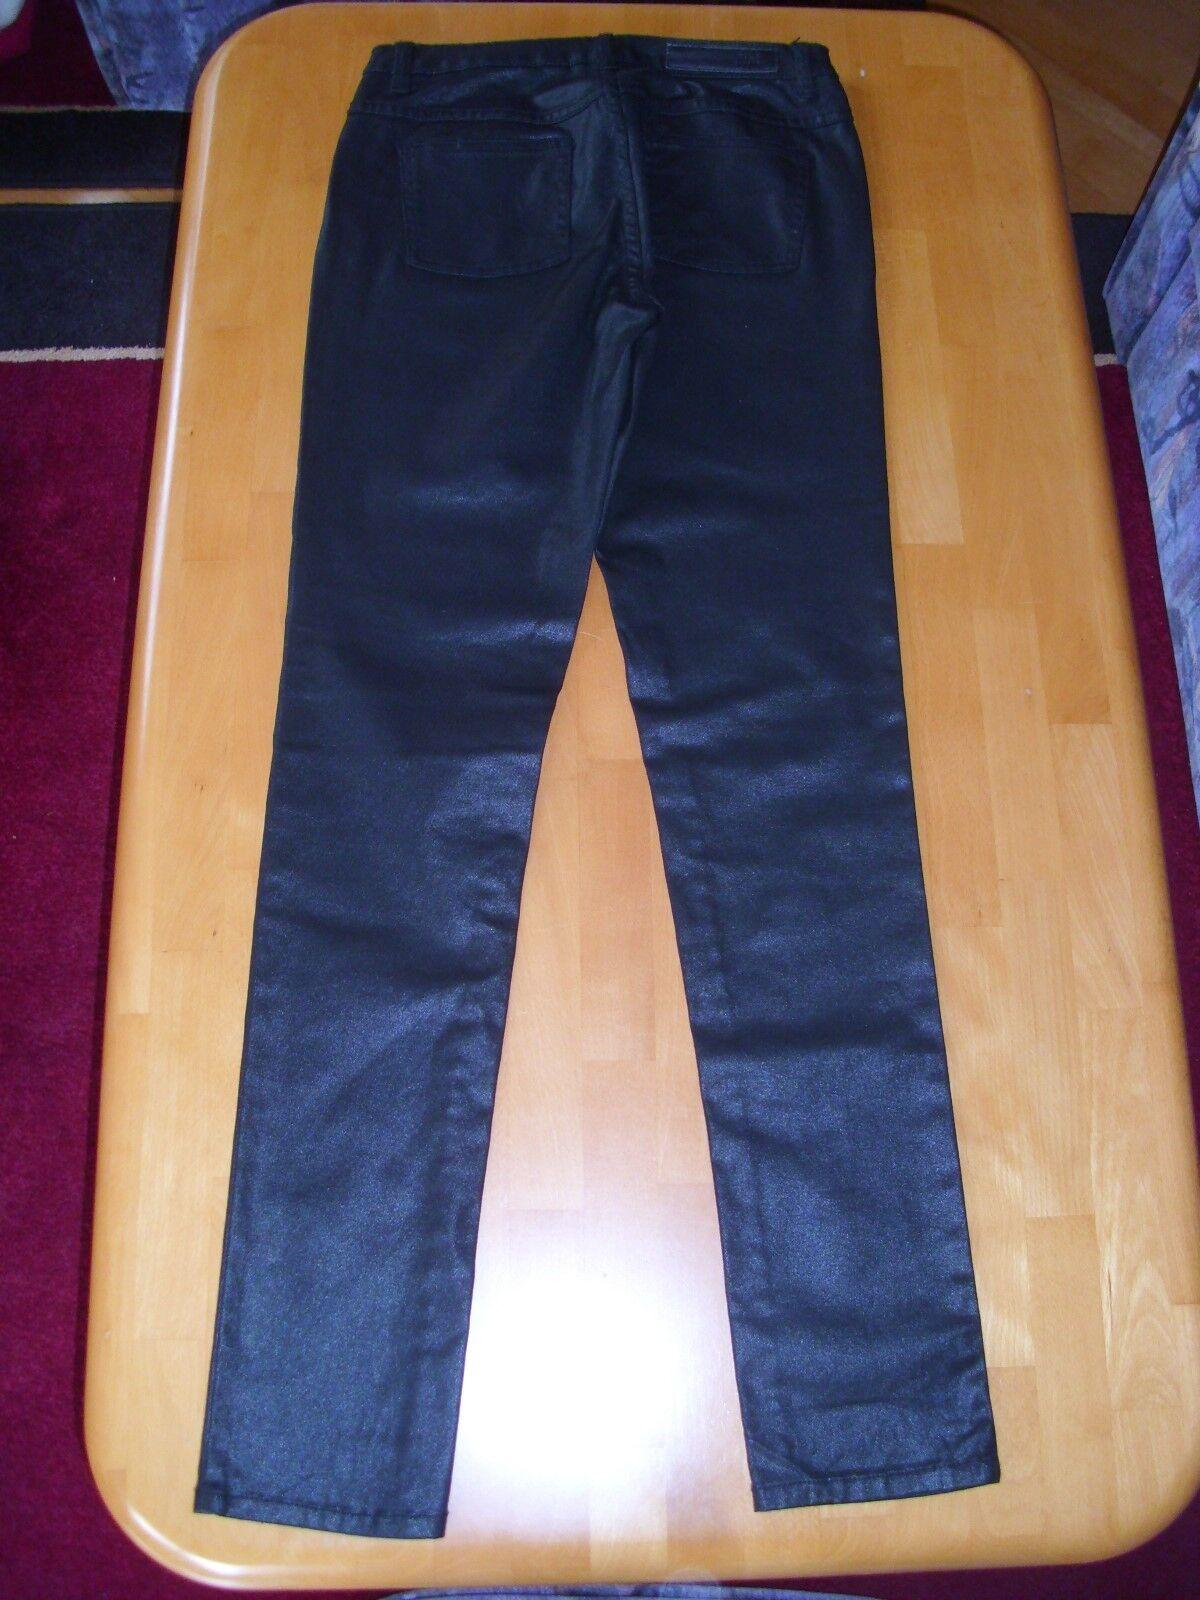 Marken Röhren Hose VILA CLOTHES schwarz Glanz 29 W 34 L  neu